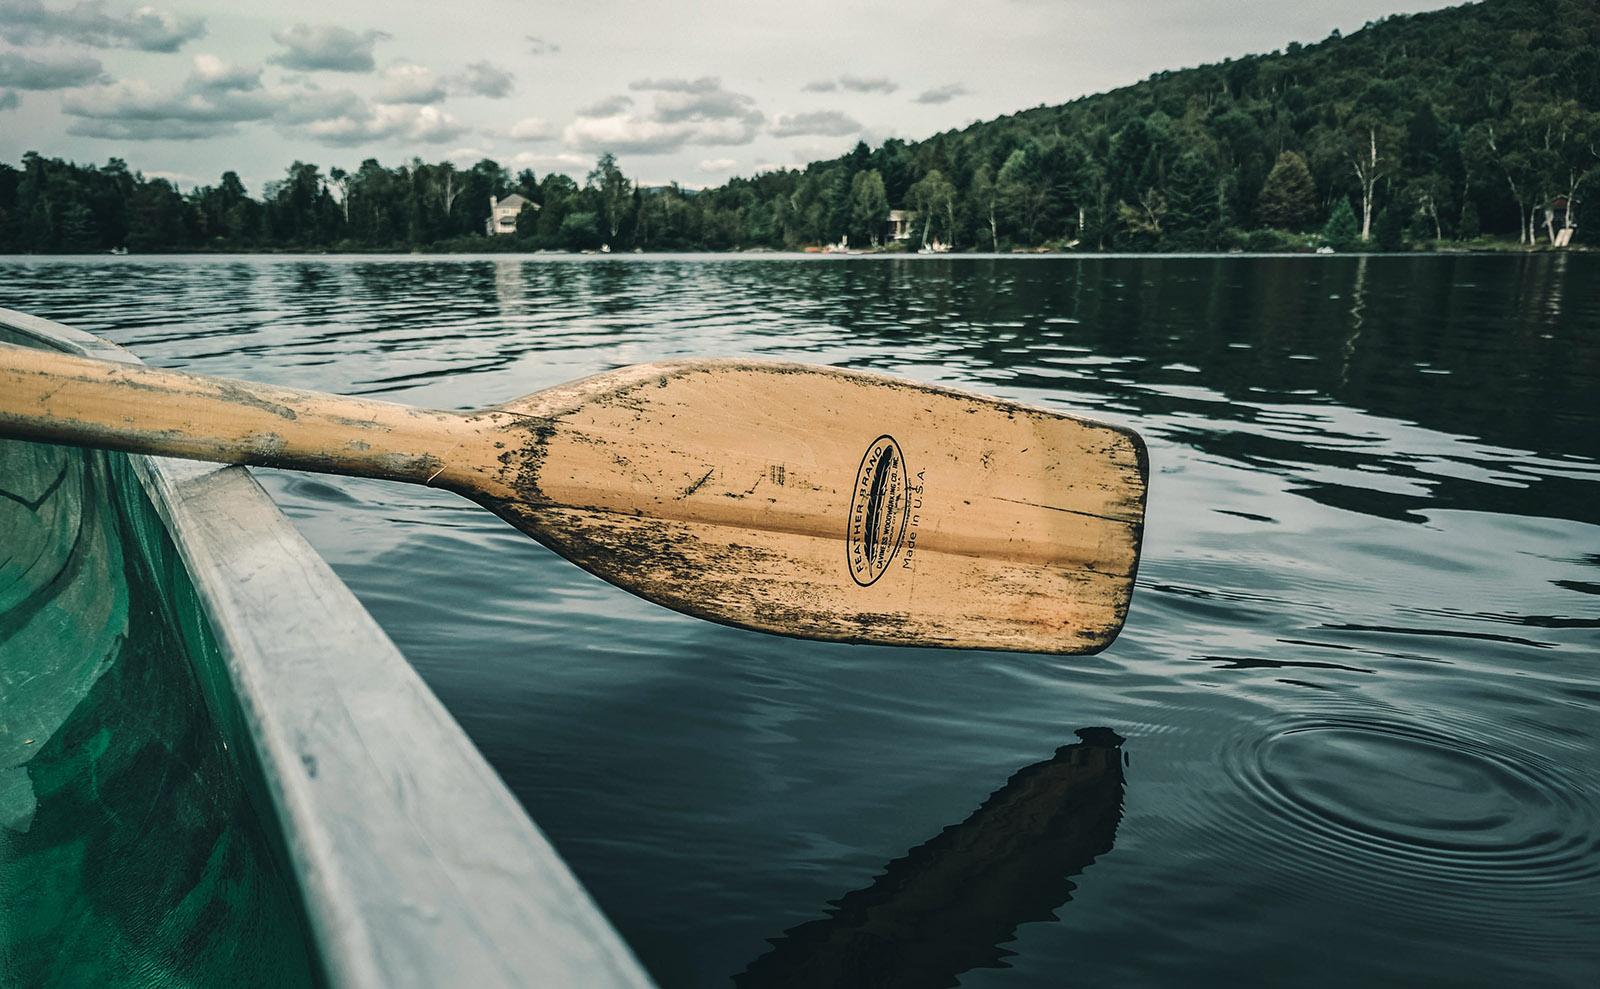 a canoe on a glassy lake